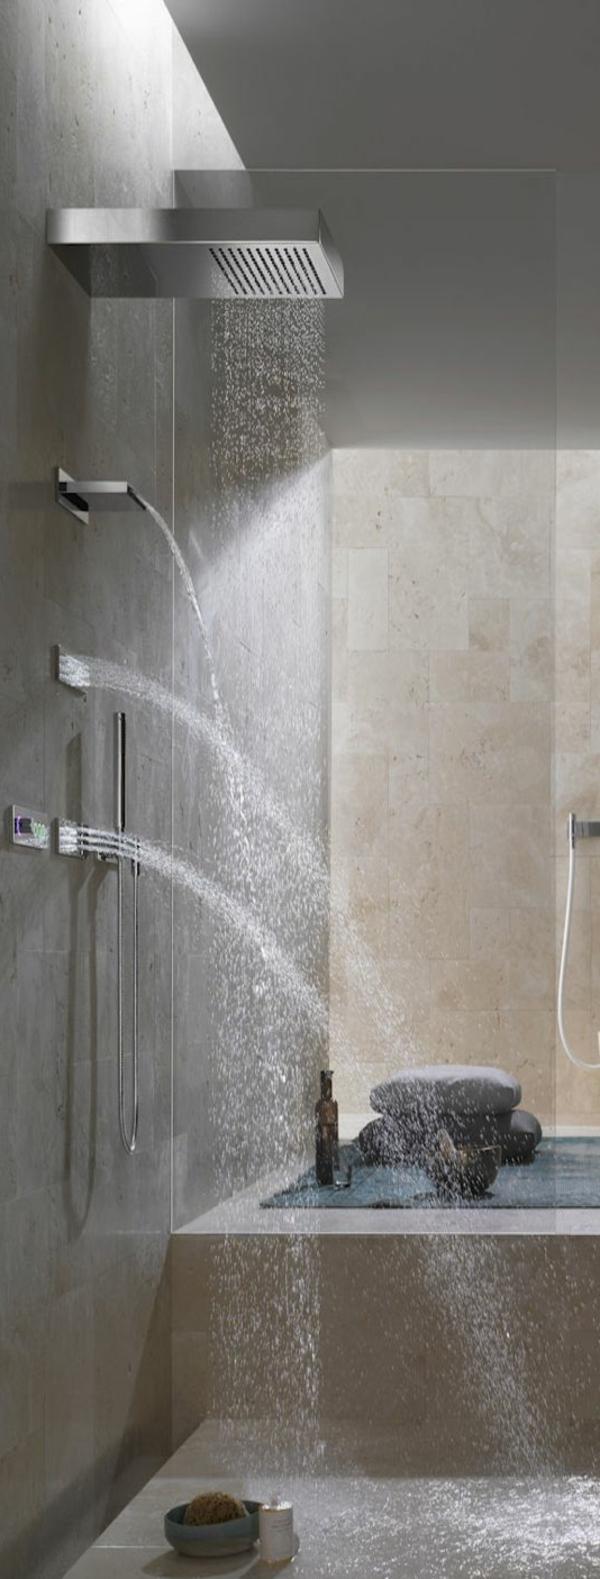 salle-de-bain-moderne-robinet-sans-toucher-infrarouge